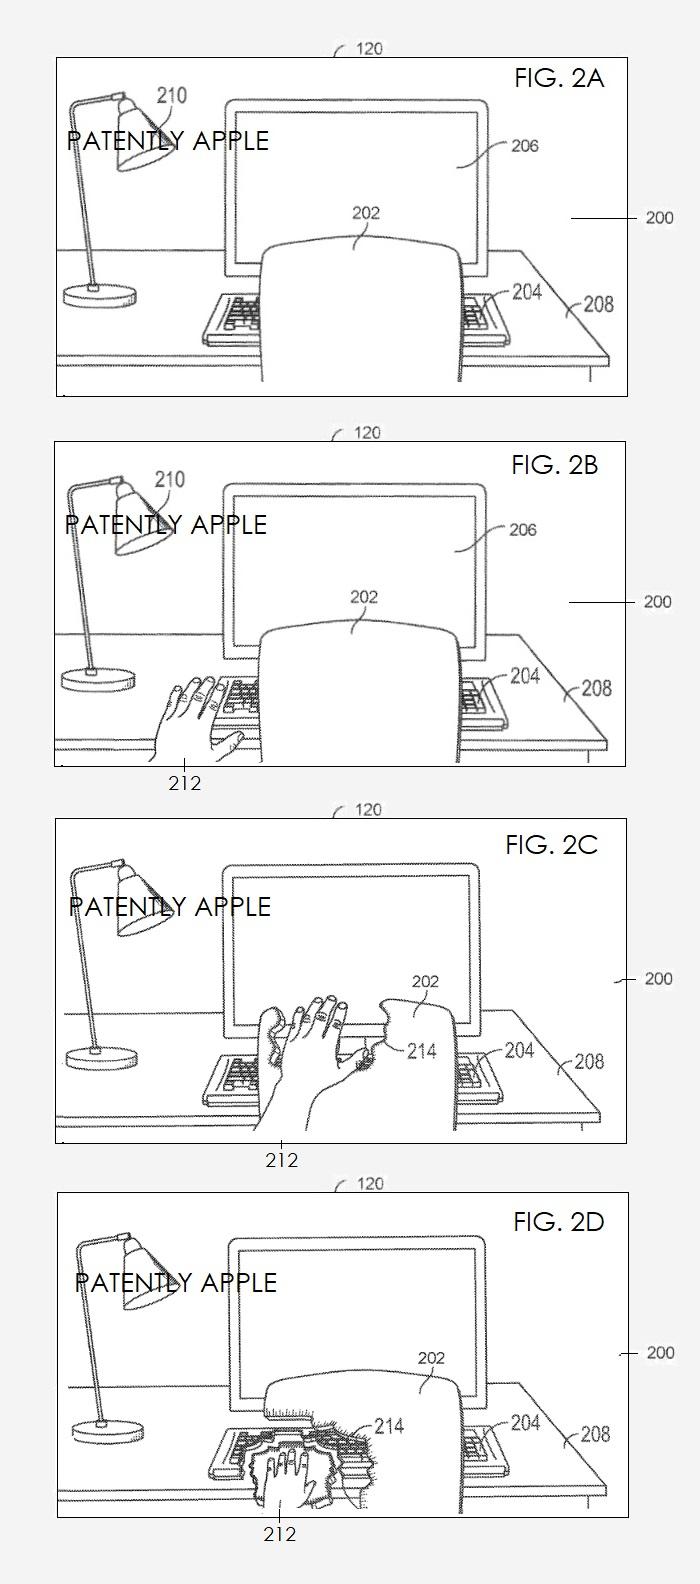 3 FINAL - -  fig. 2a apple mr patent